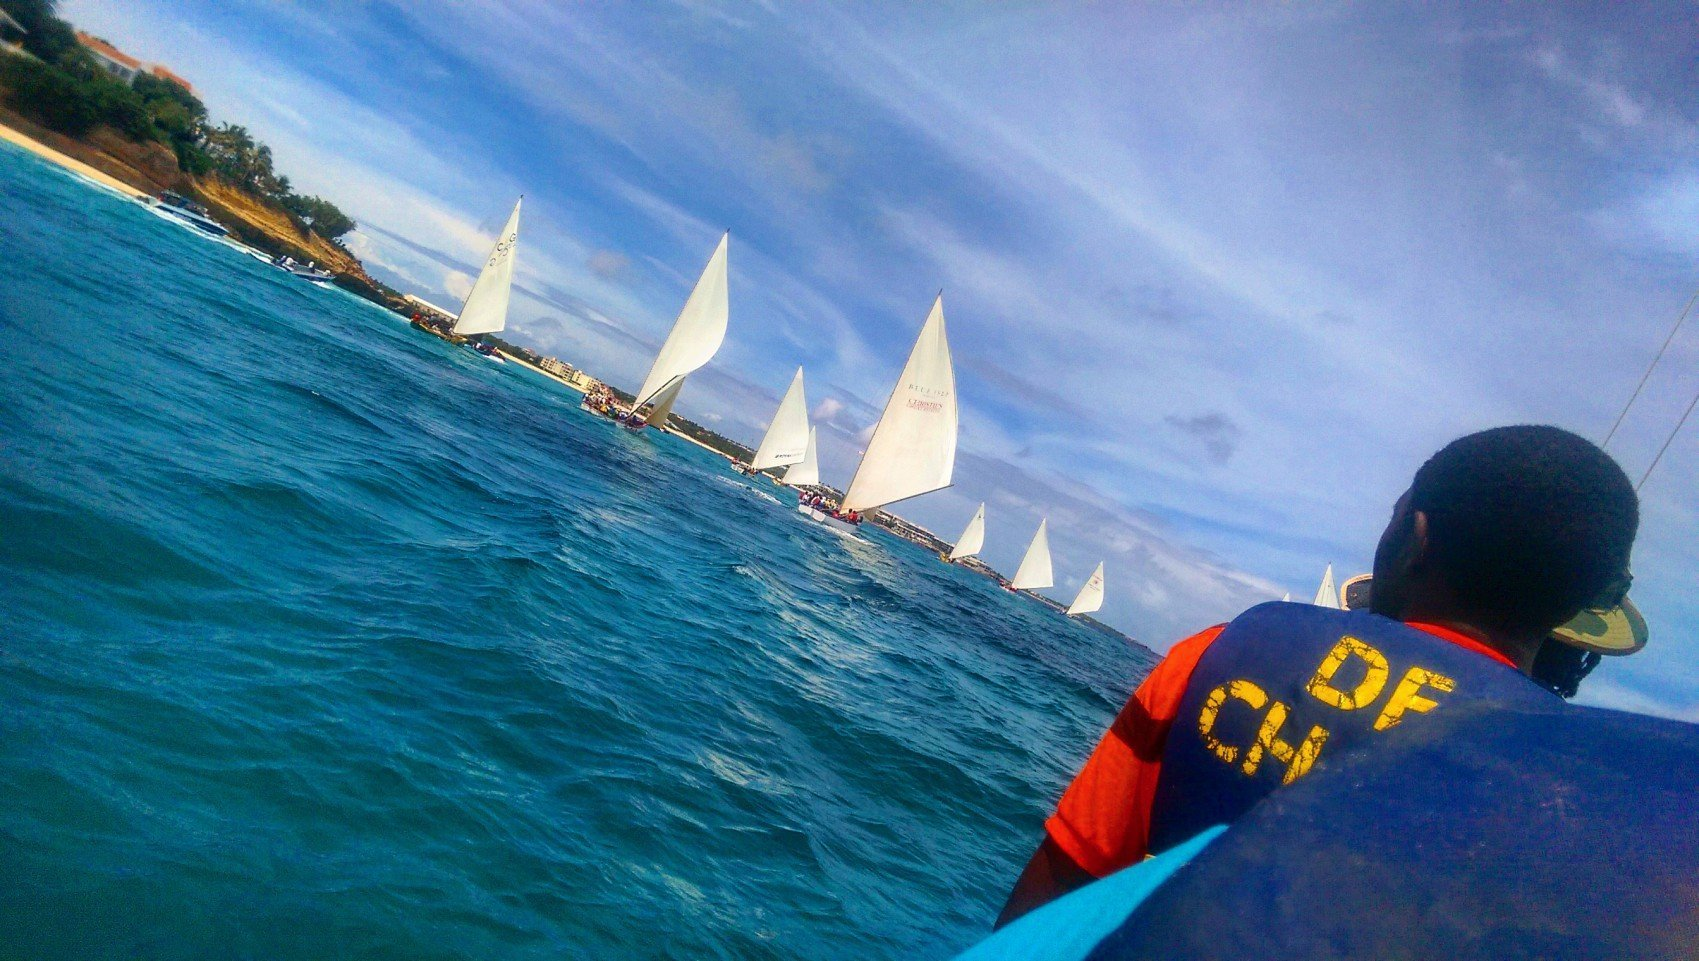 Anguilla Boat Race